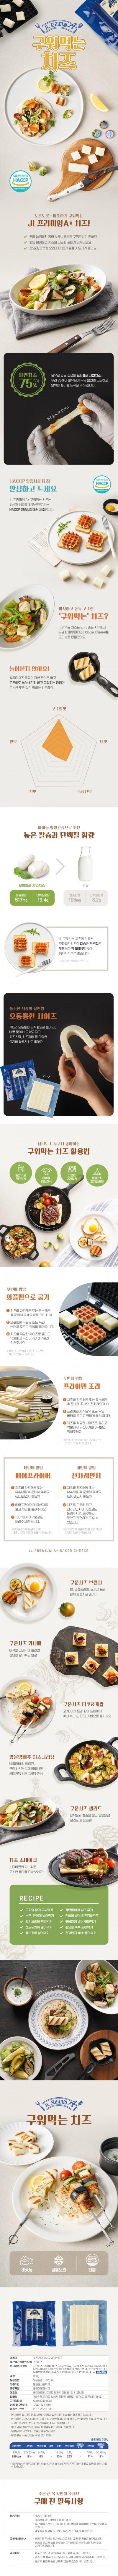 [D156]치즈 상세페이지 제작+촬영